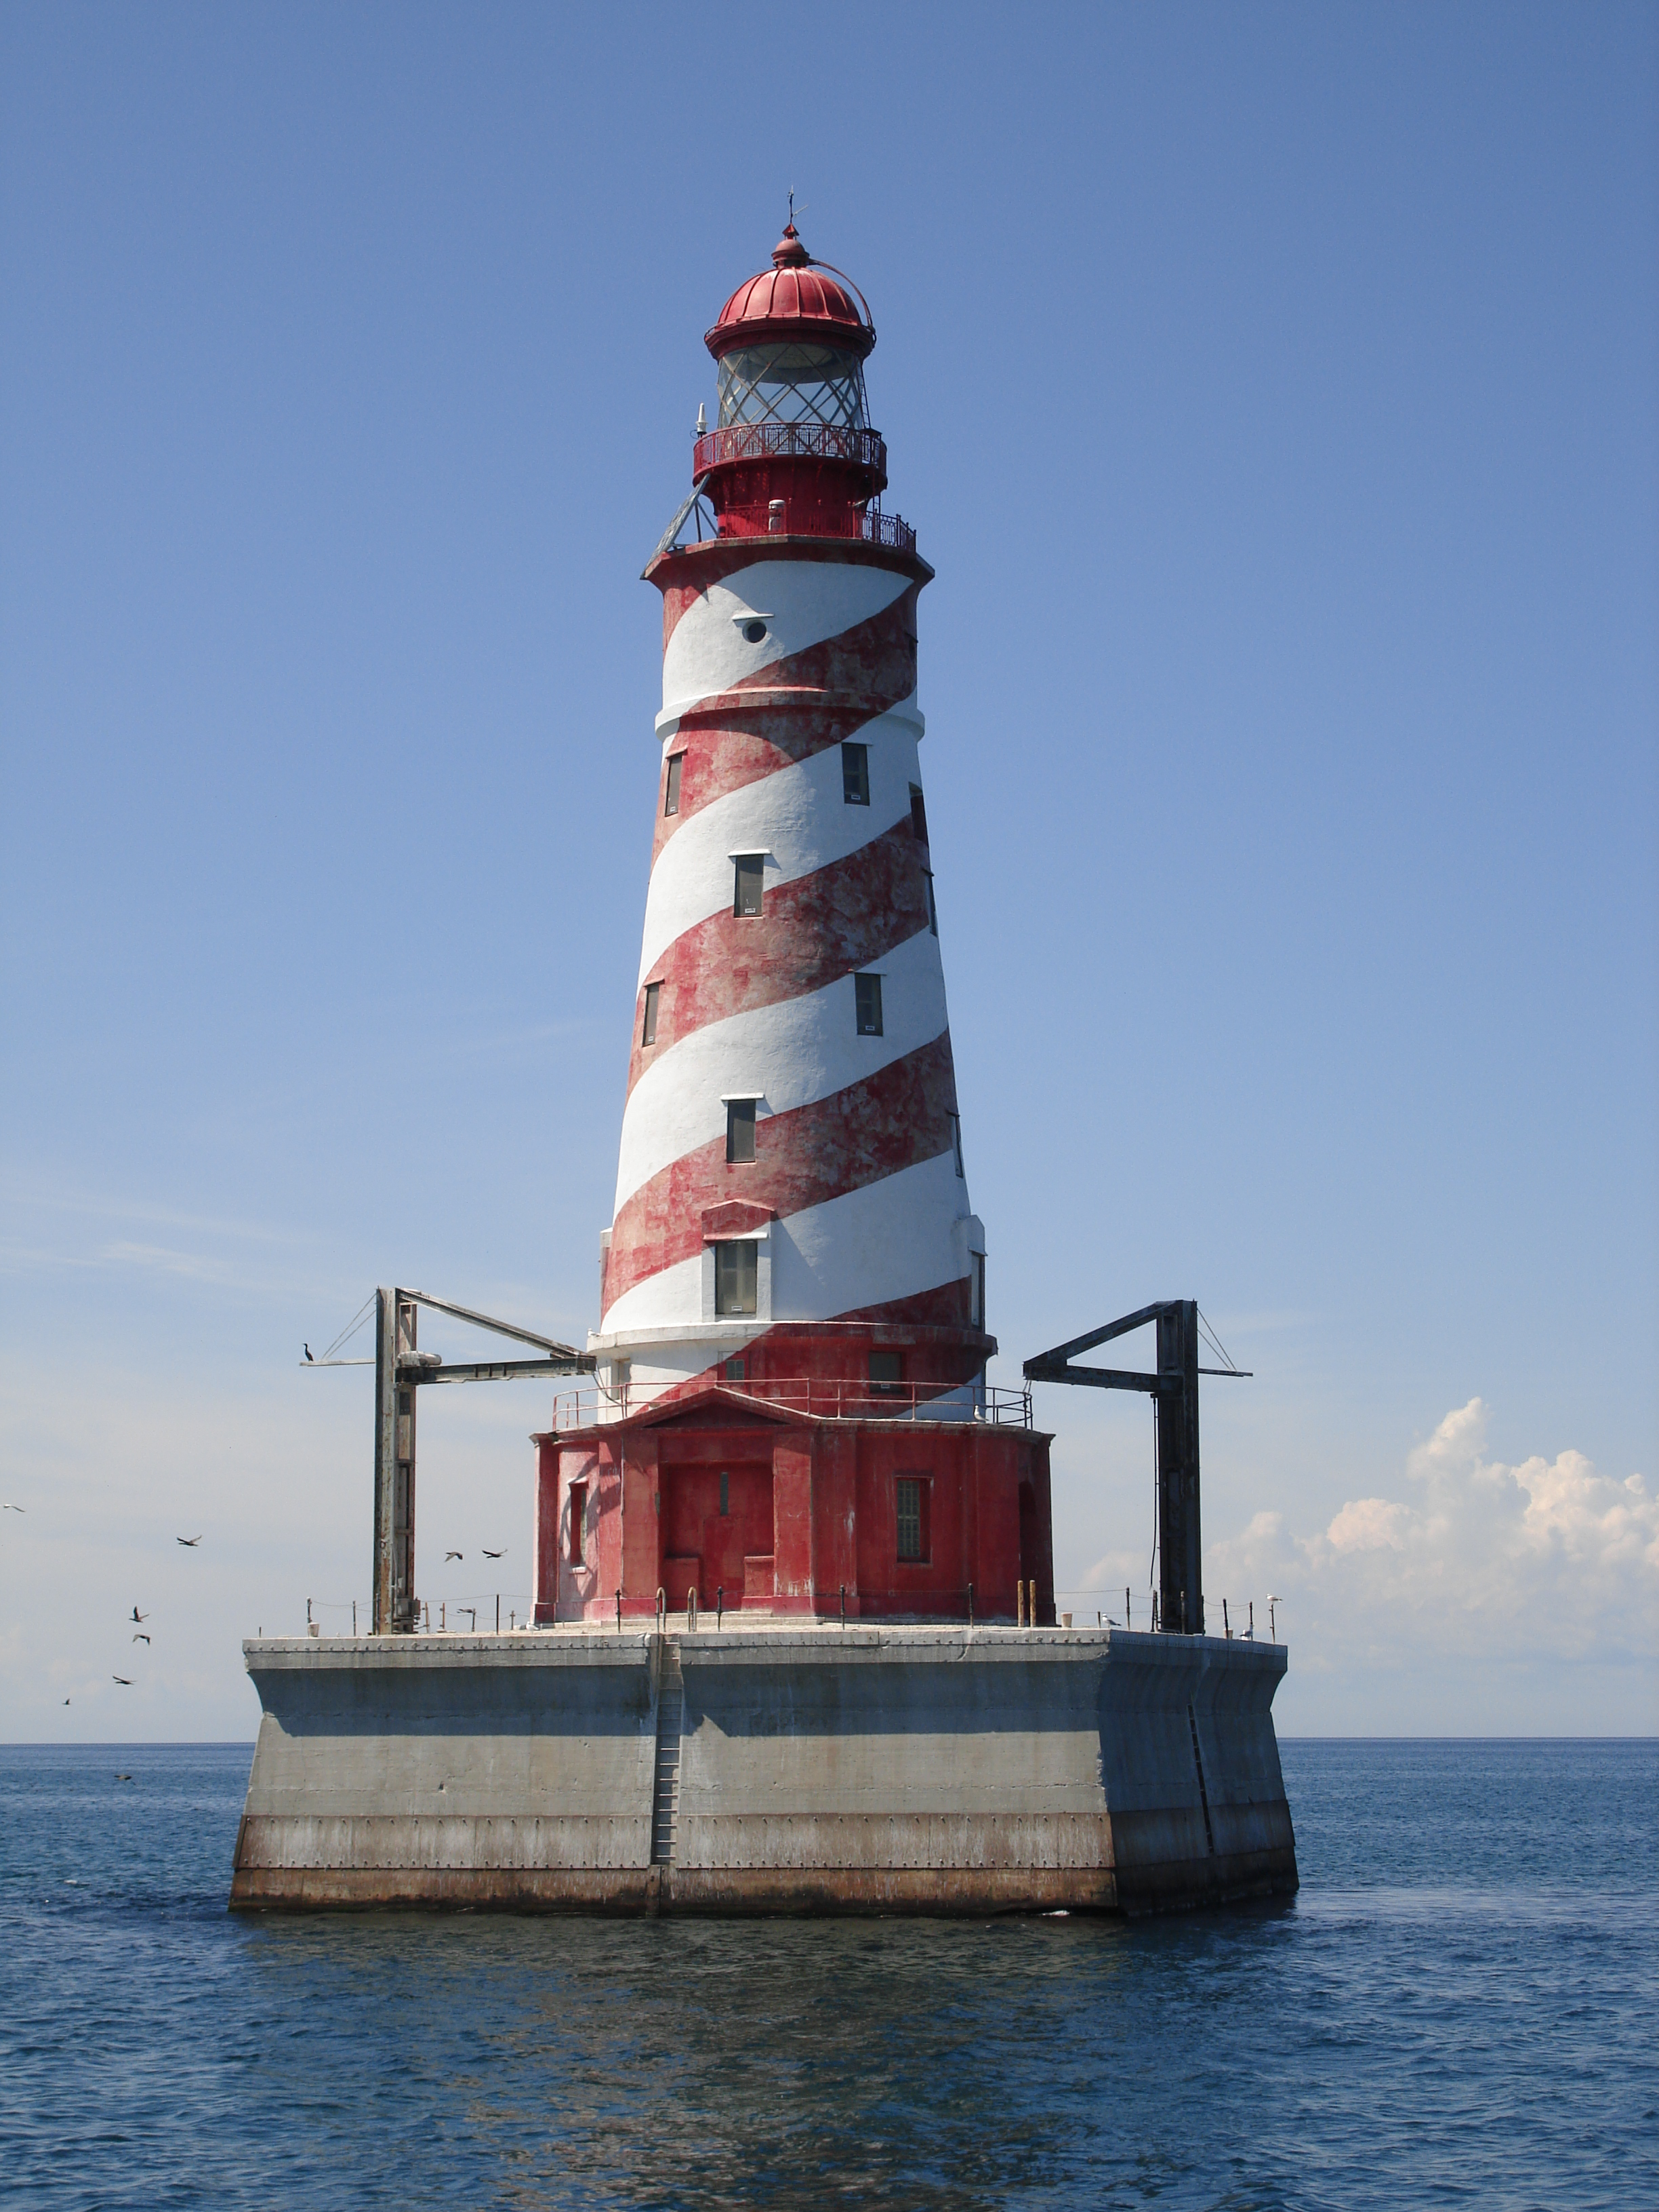 File:White Shoal Lighthouse.JPG - Wikipedia